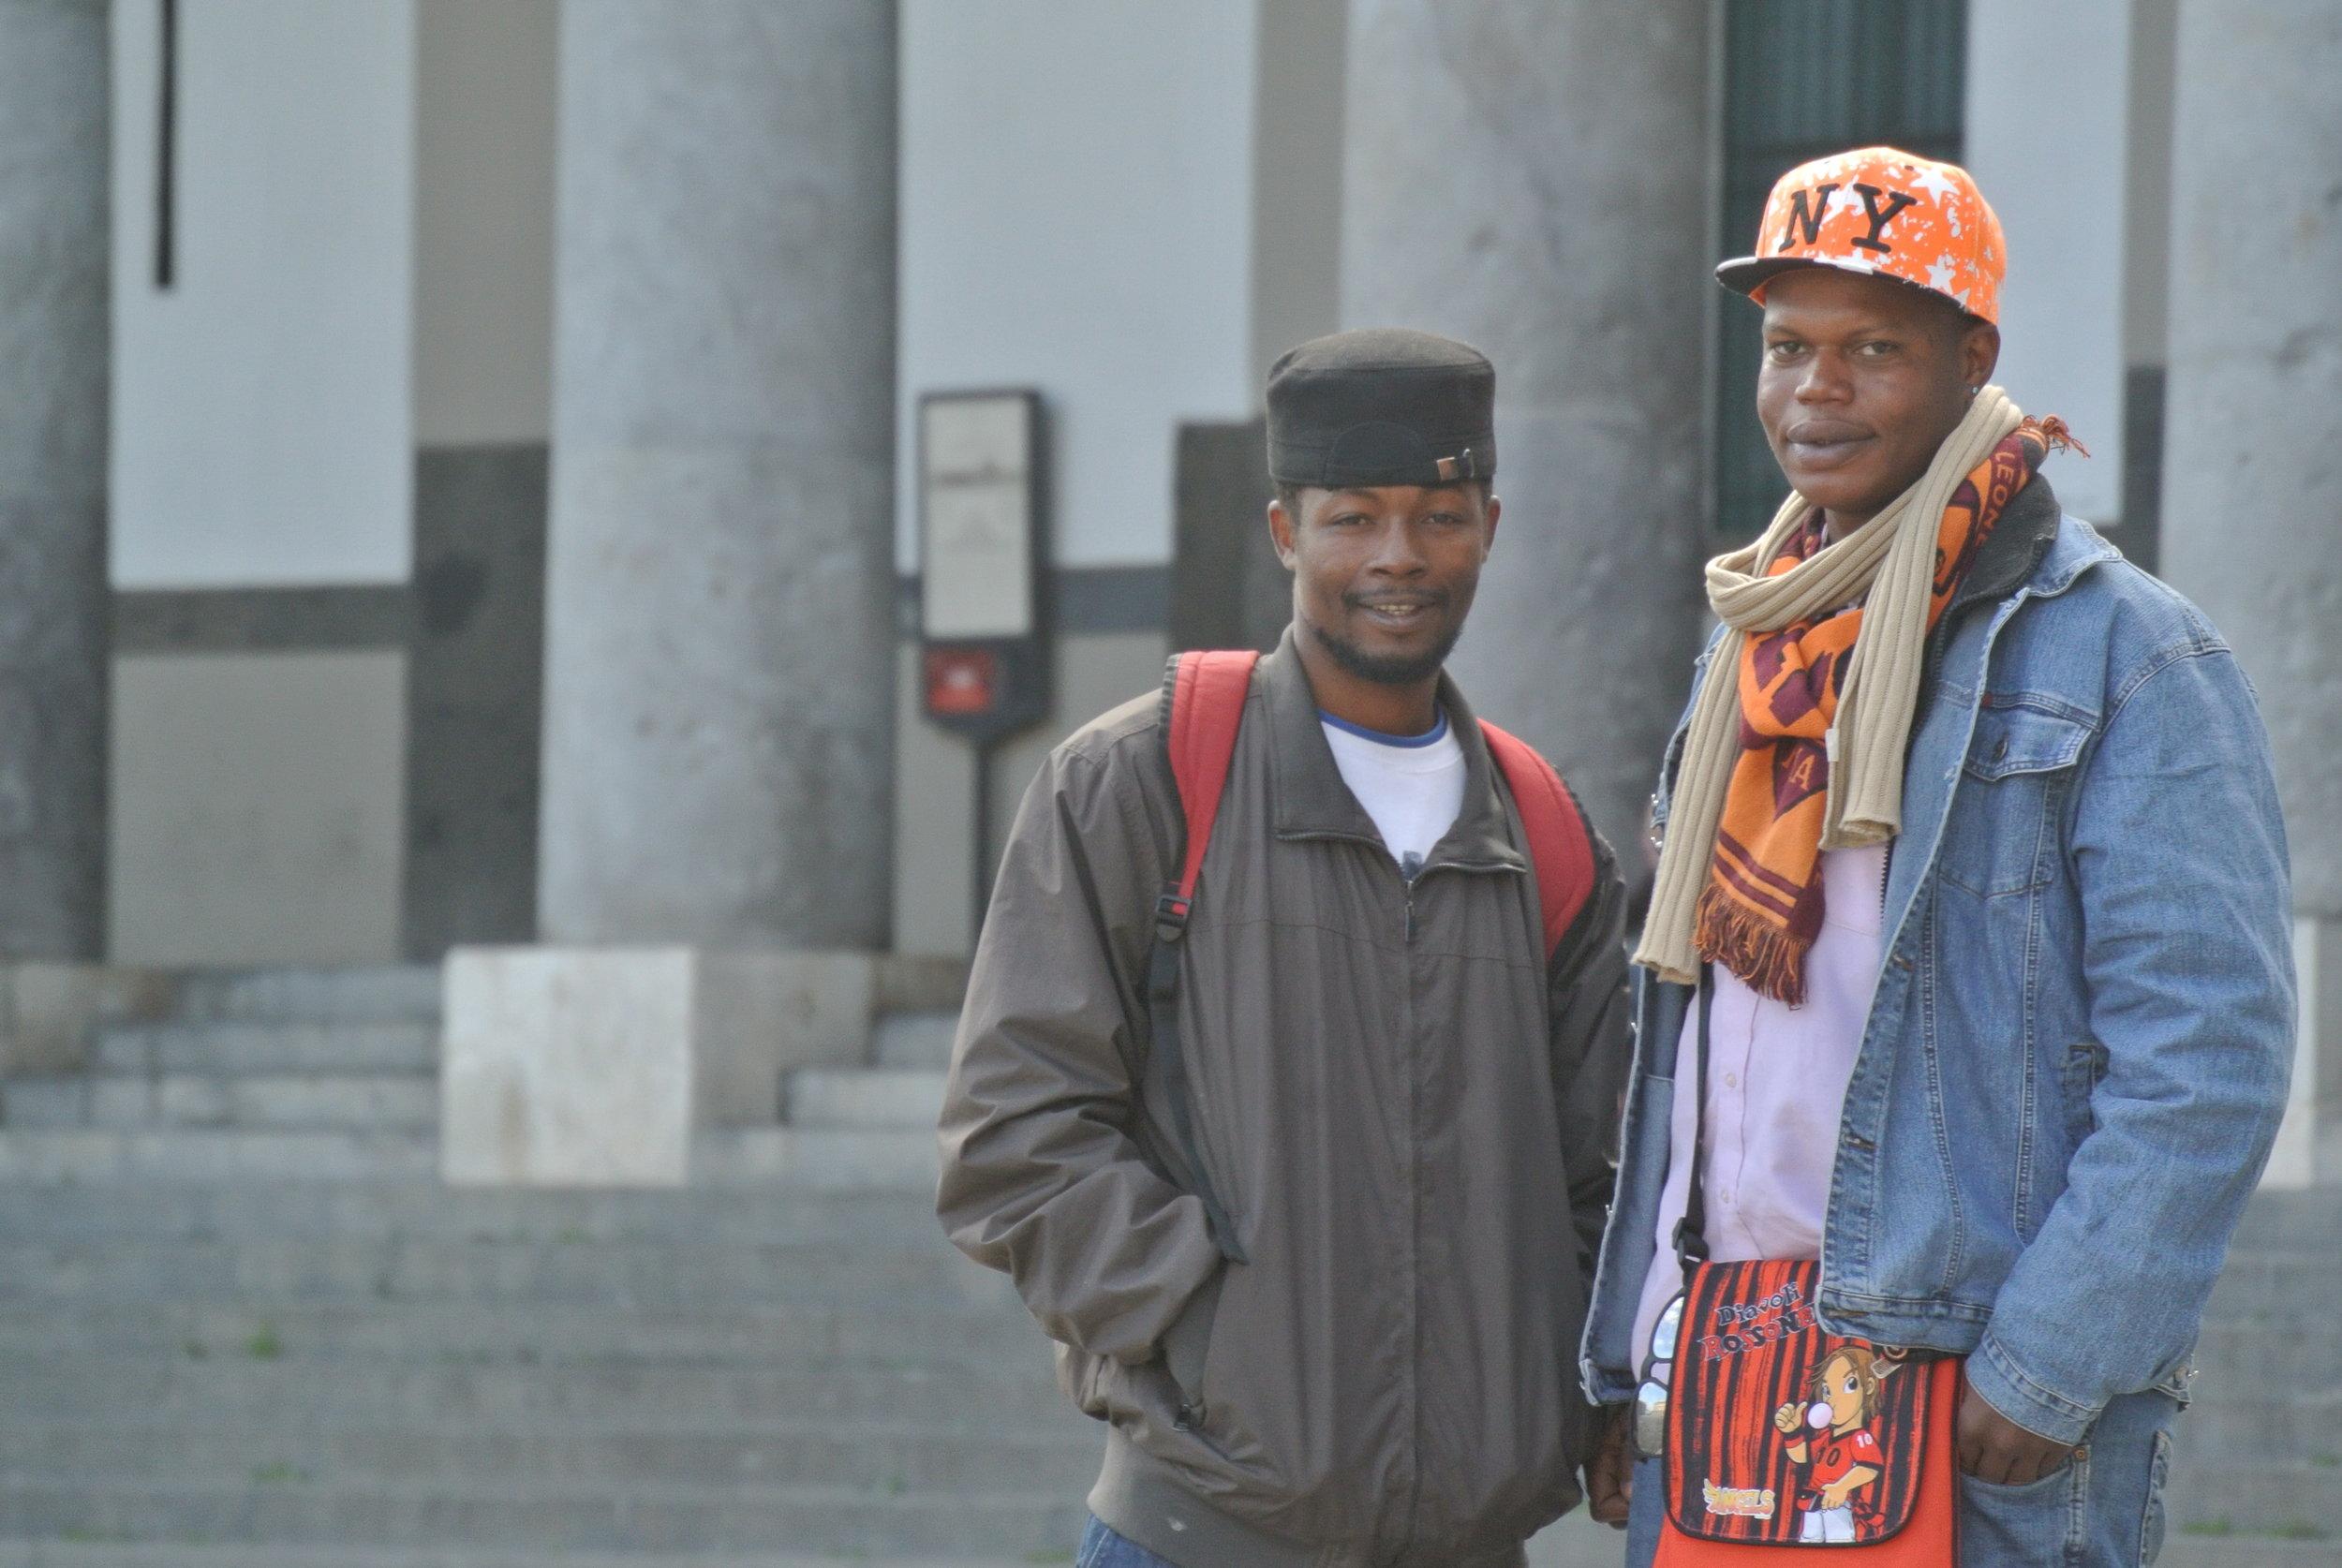 Ousman and Yoro at  Piazza Plebiscito.  Naples, Italy; November 2017. © Pamela Kerpius